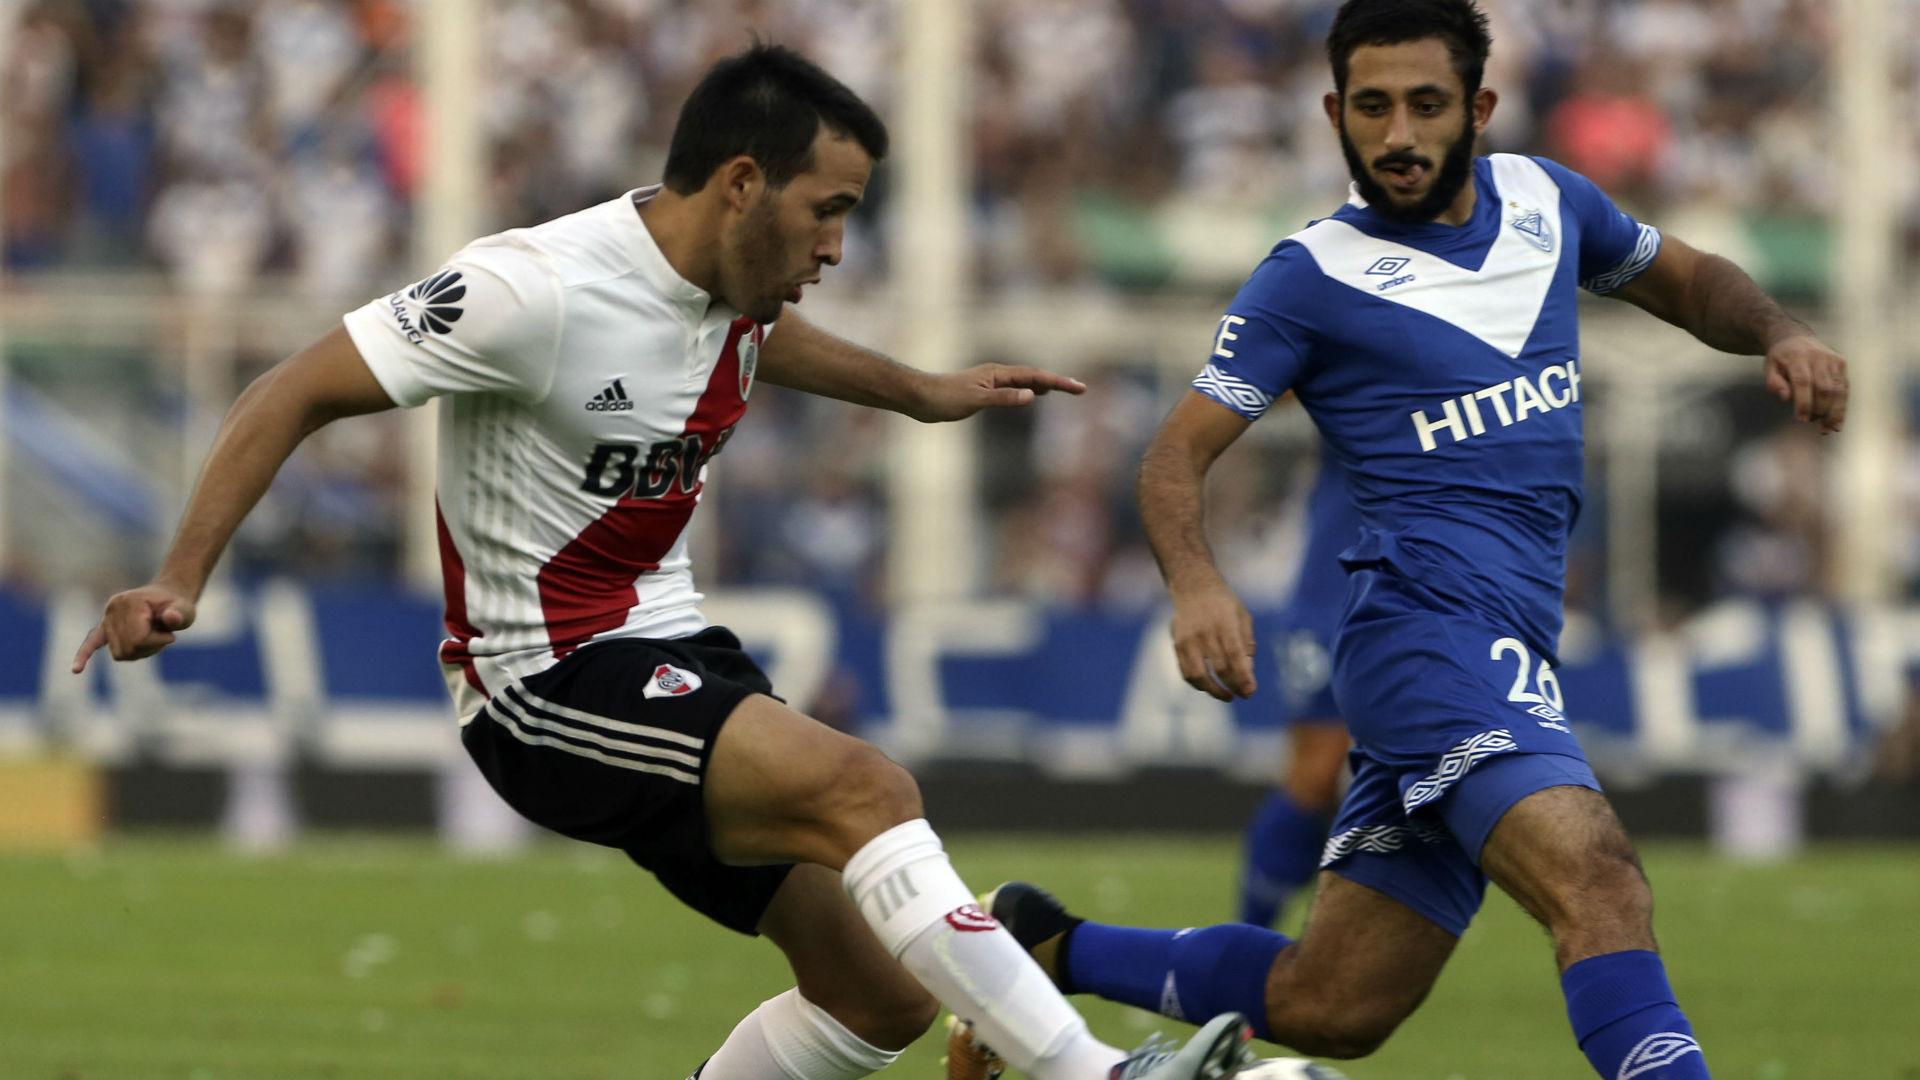 Camilo Mayada Velez River Plate Superliga Argentina 24022018